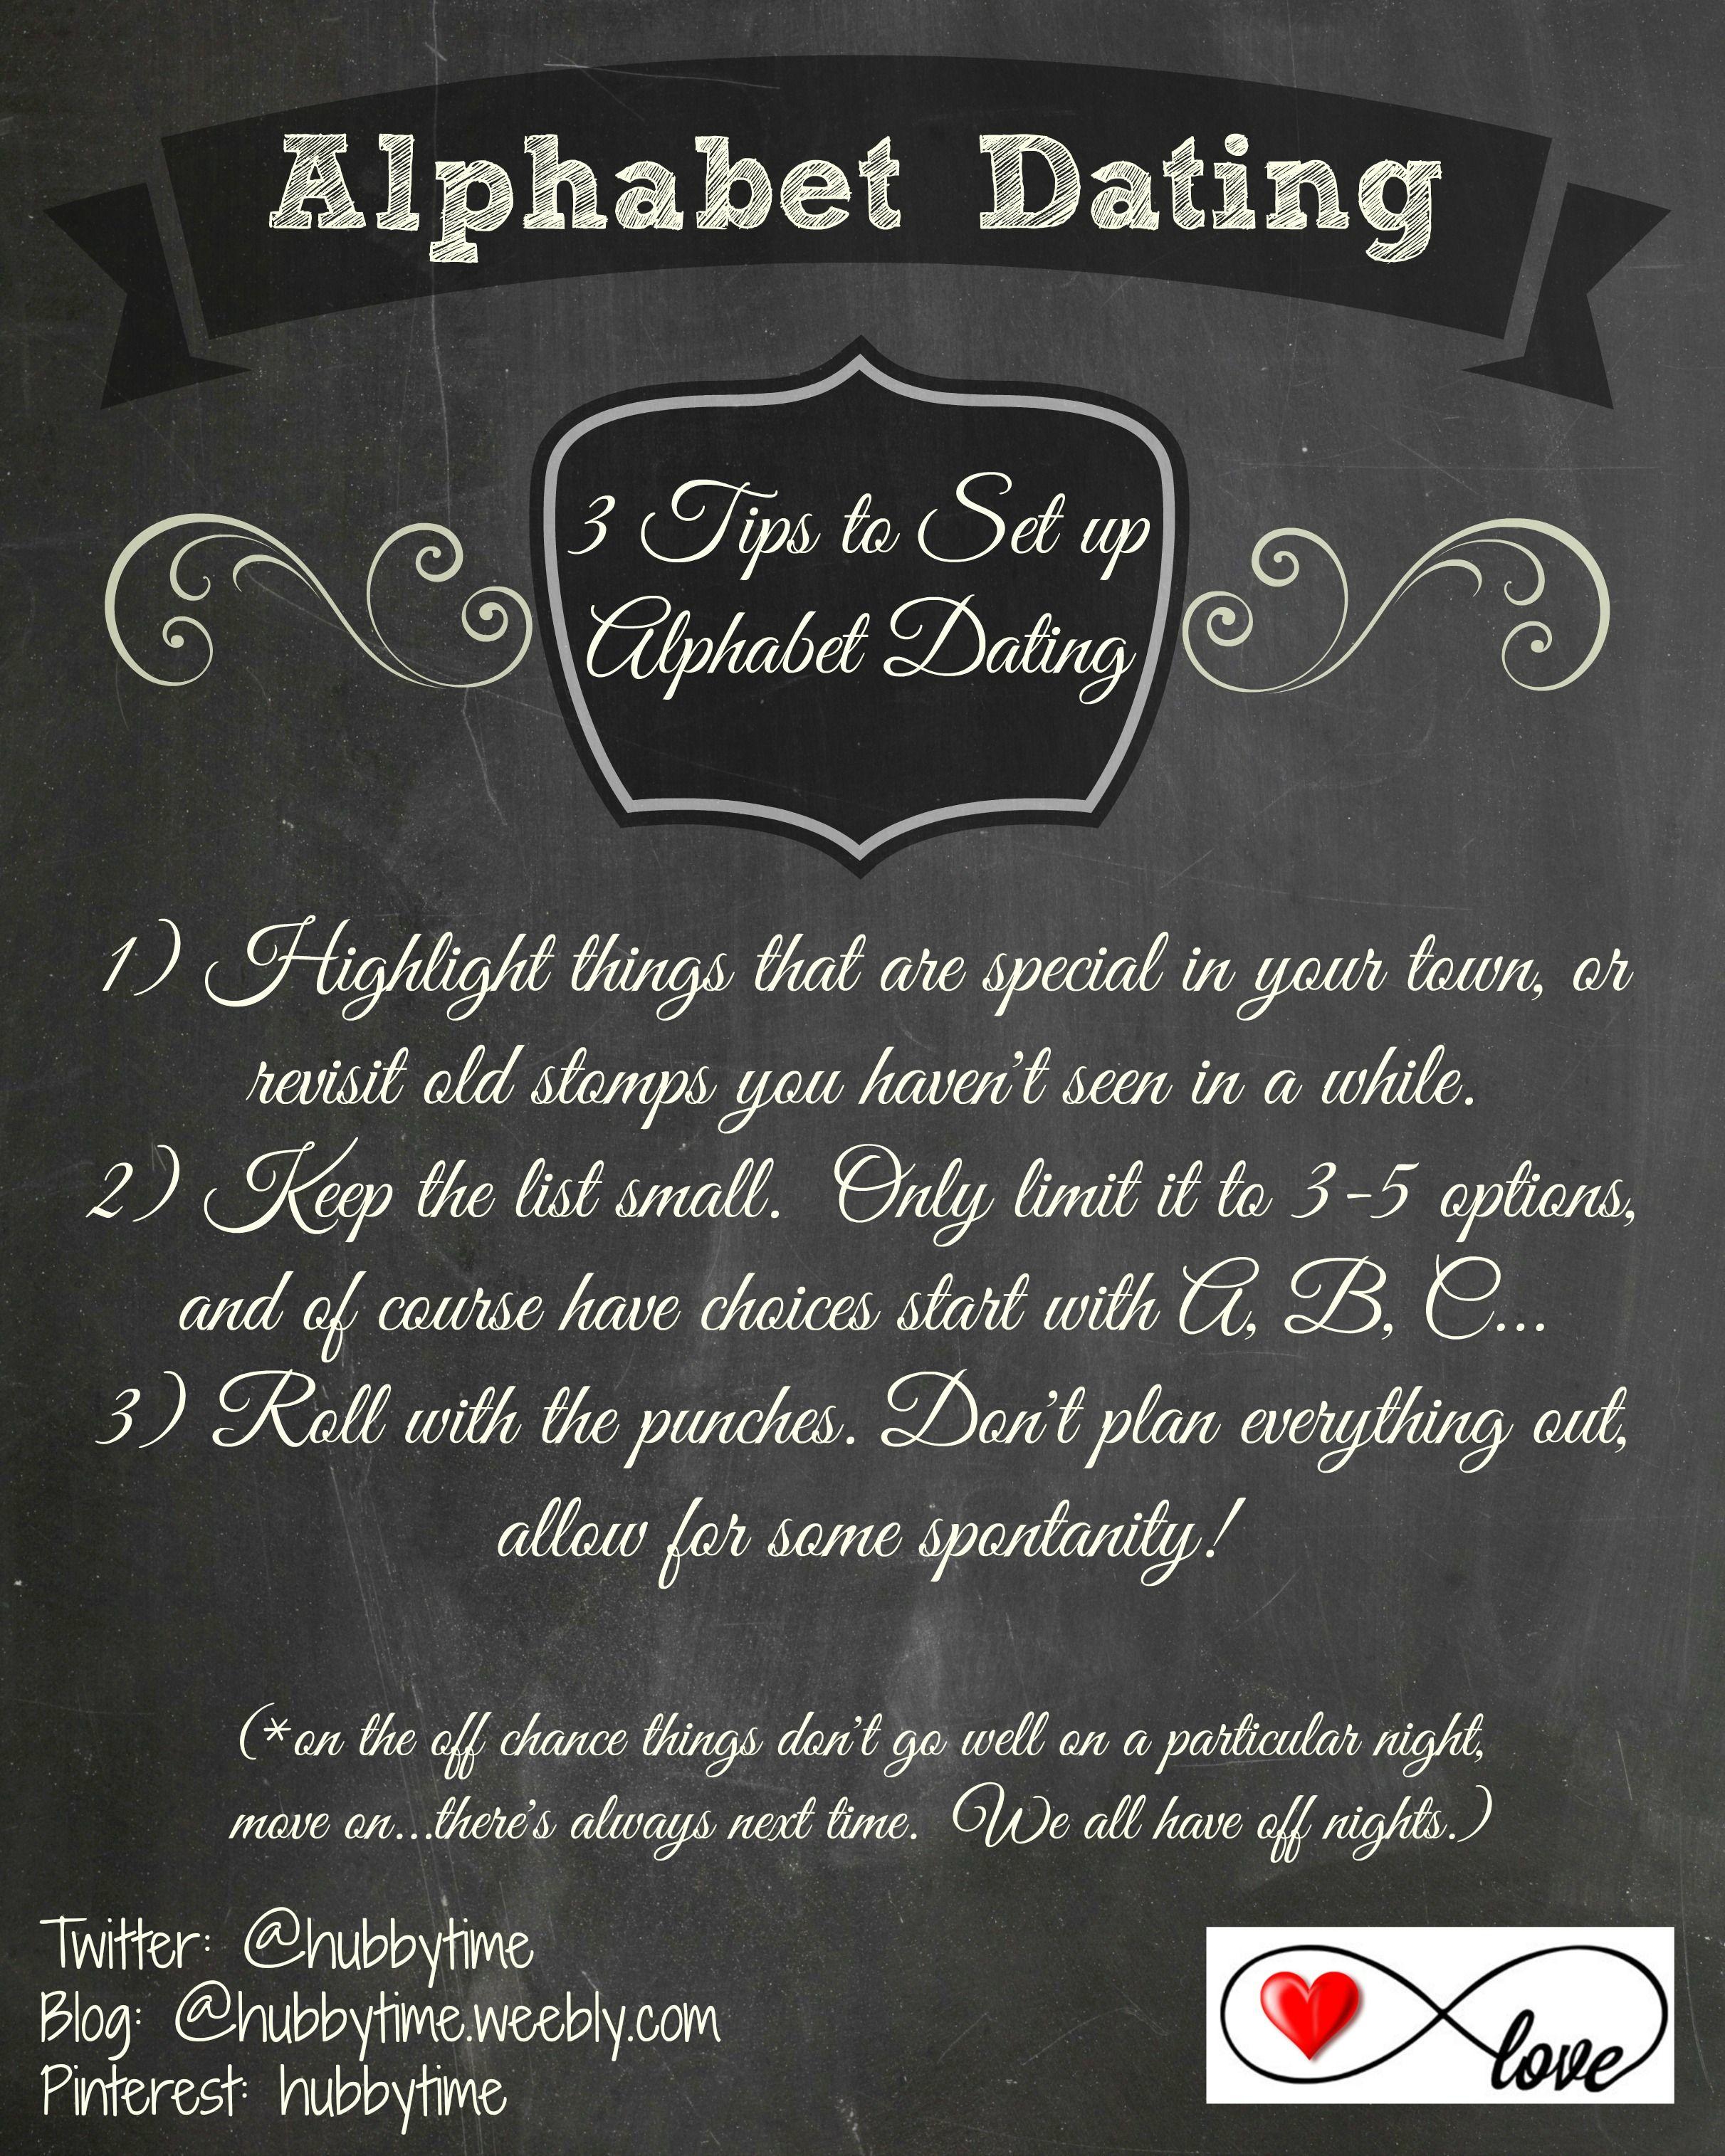 Alphabet dating ideas for older